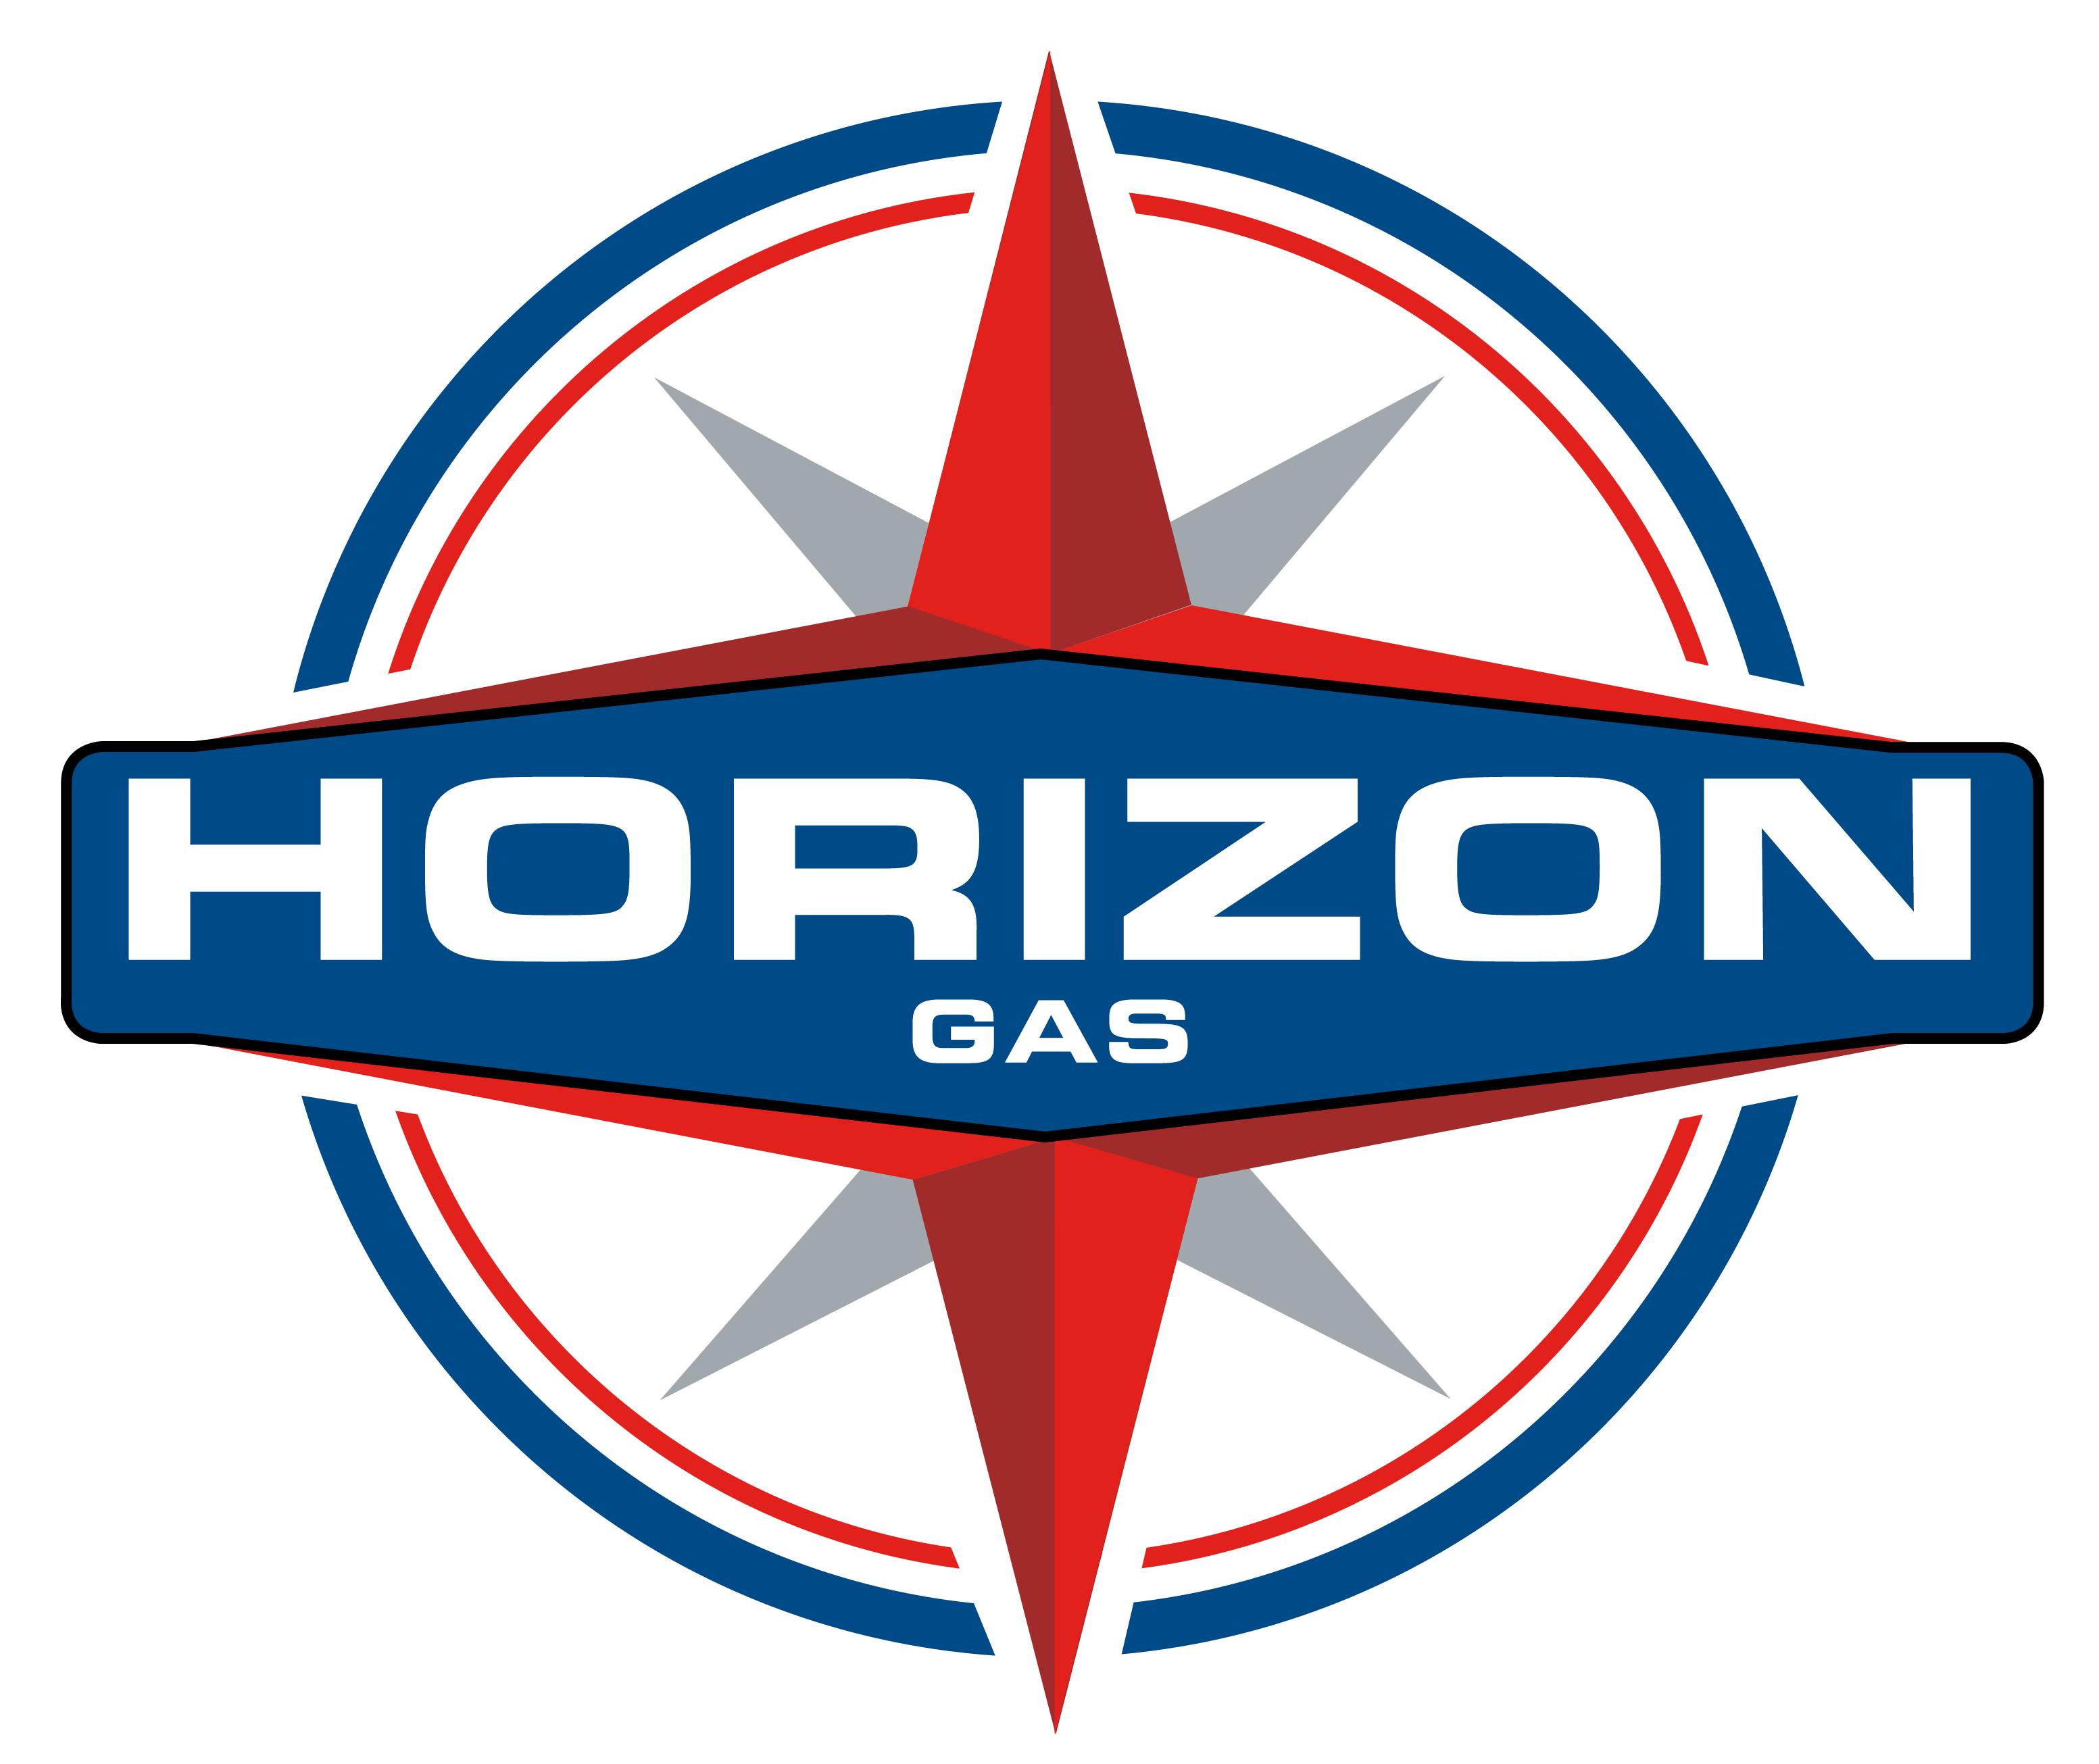 Horizon Gas Station